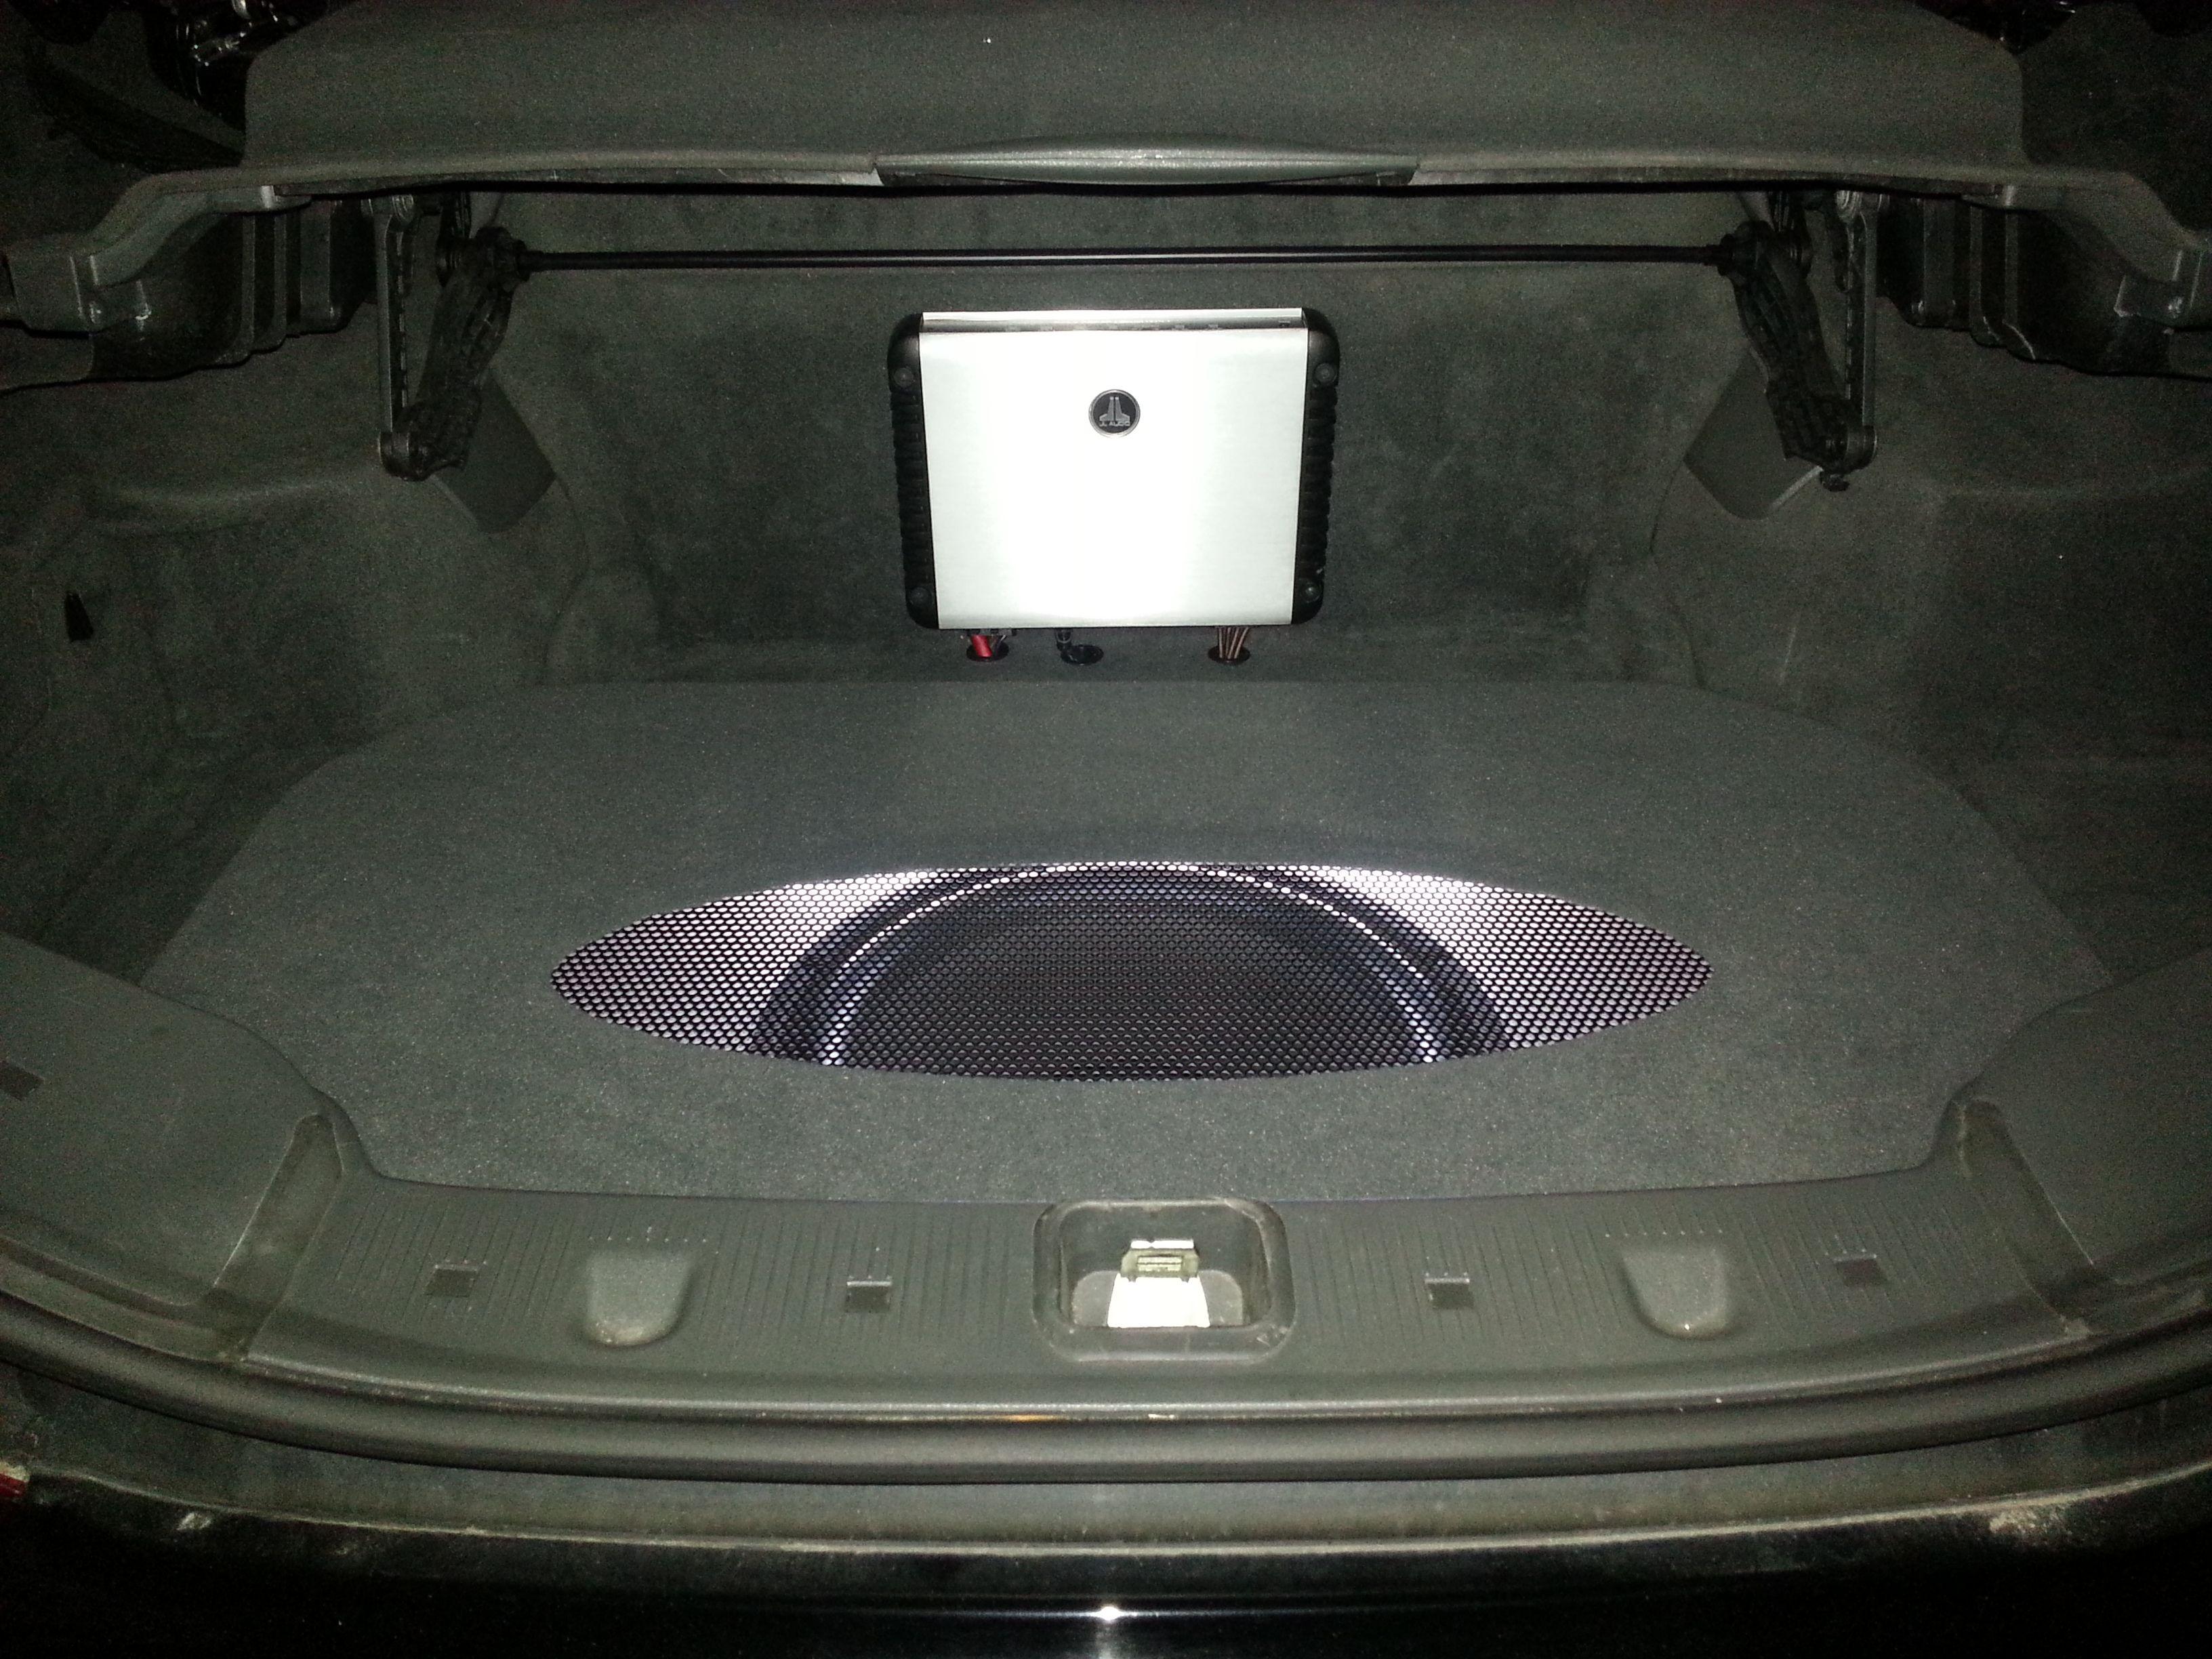 Simple setup in an SL500  16